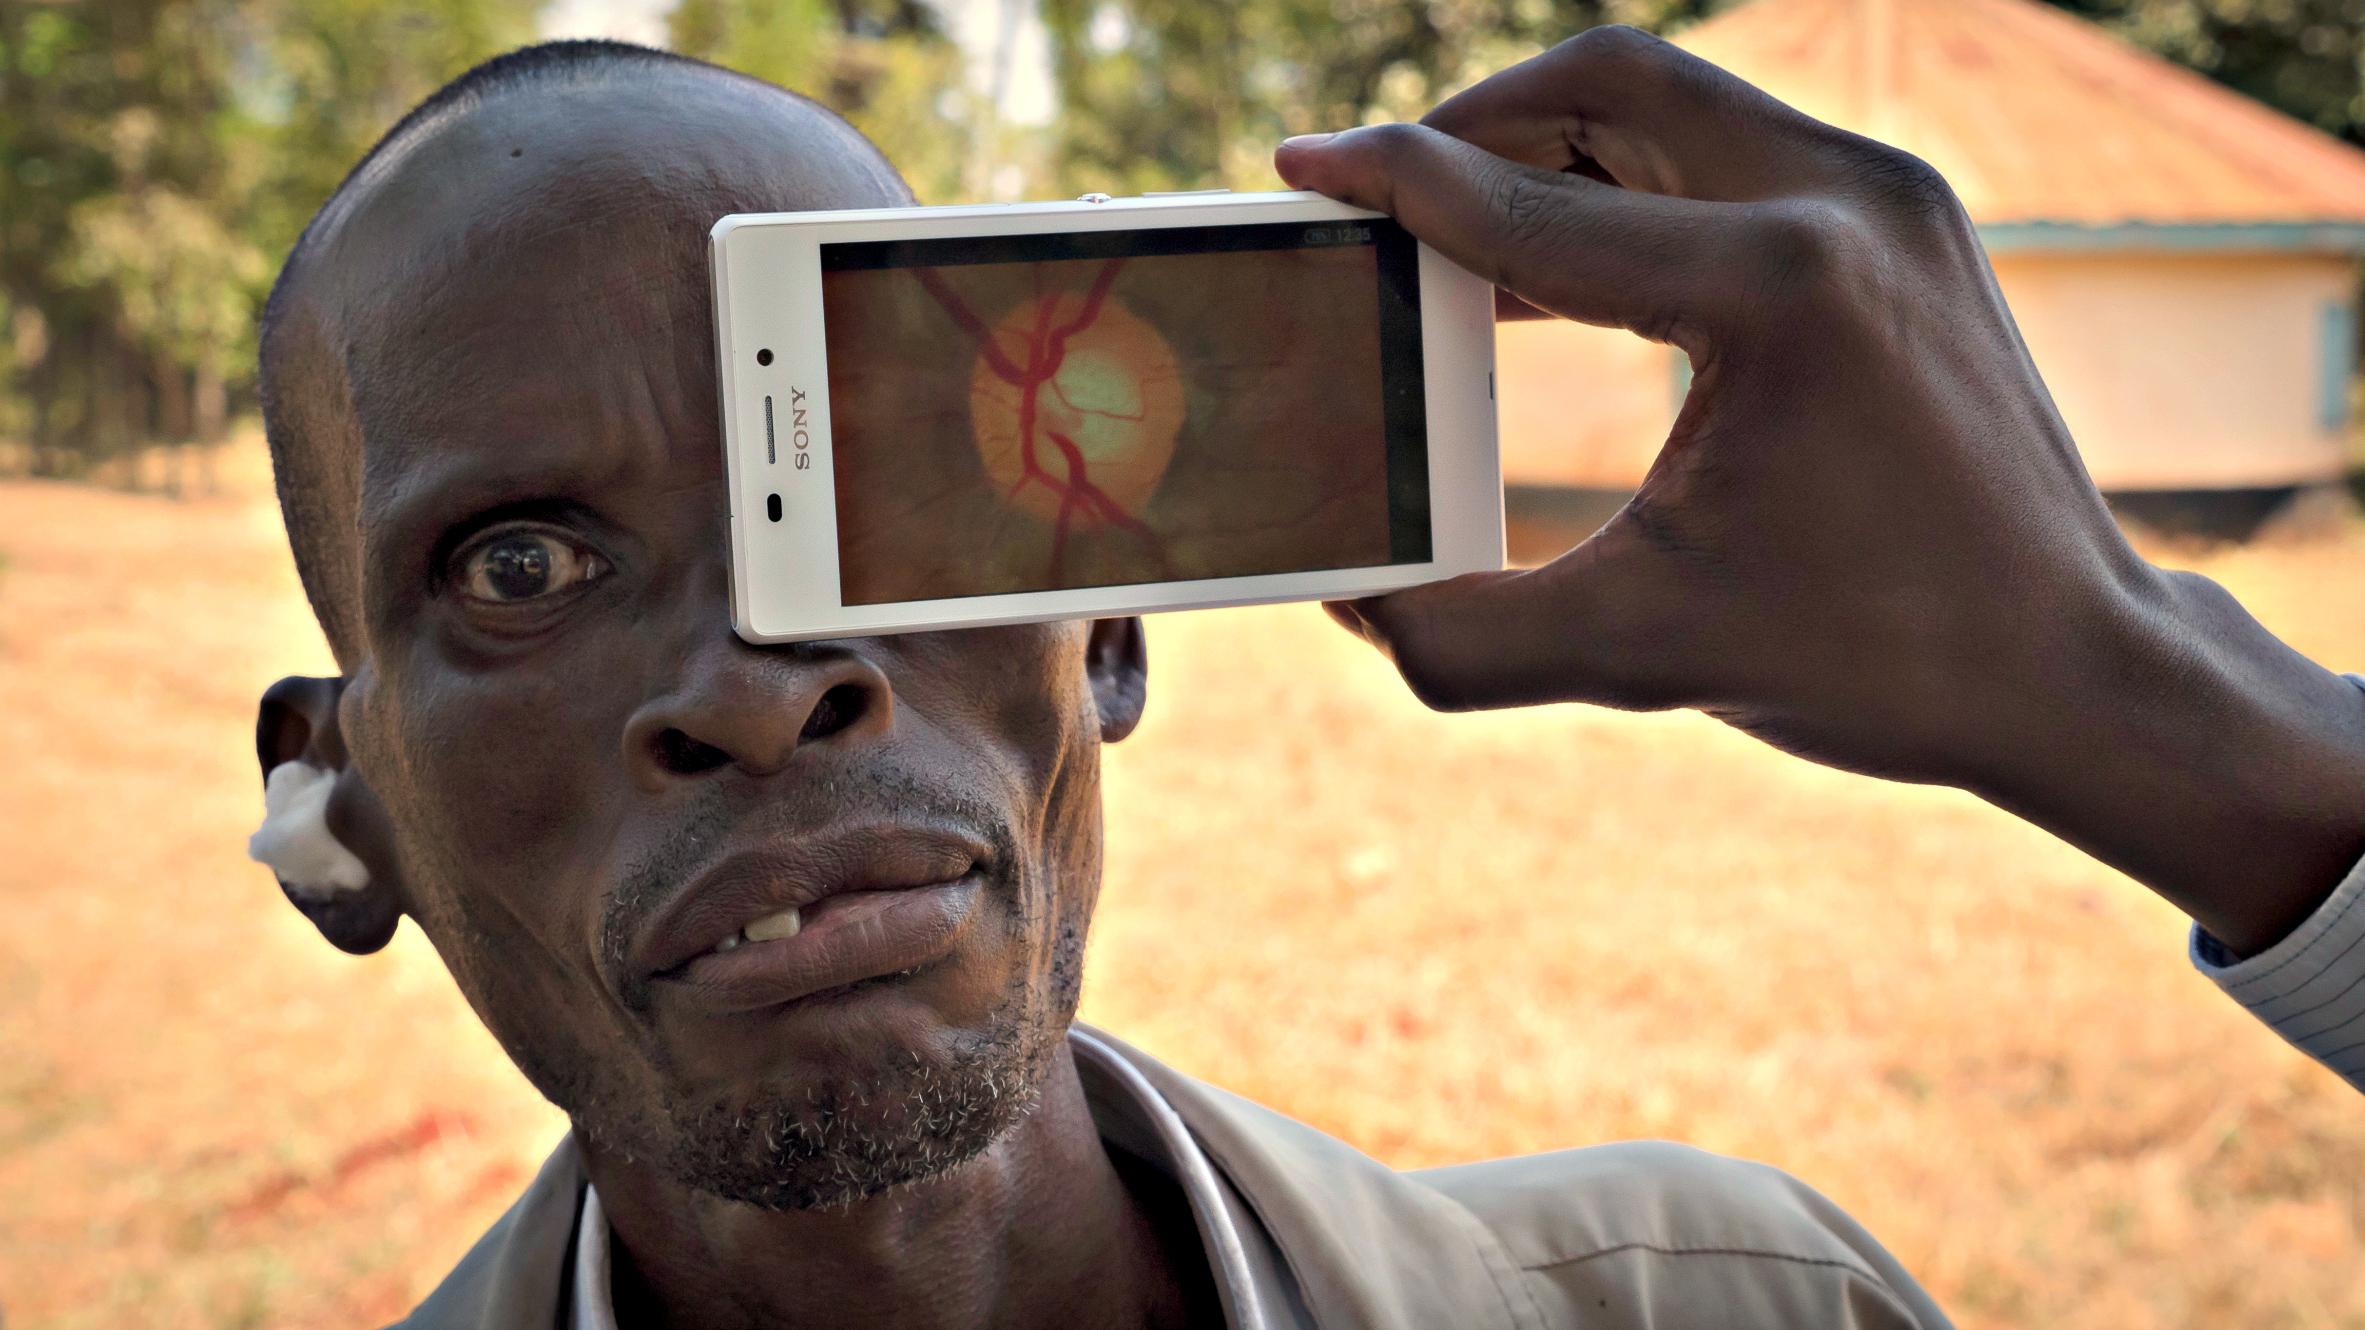 peek_retina_test_i_kenya.jpg